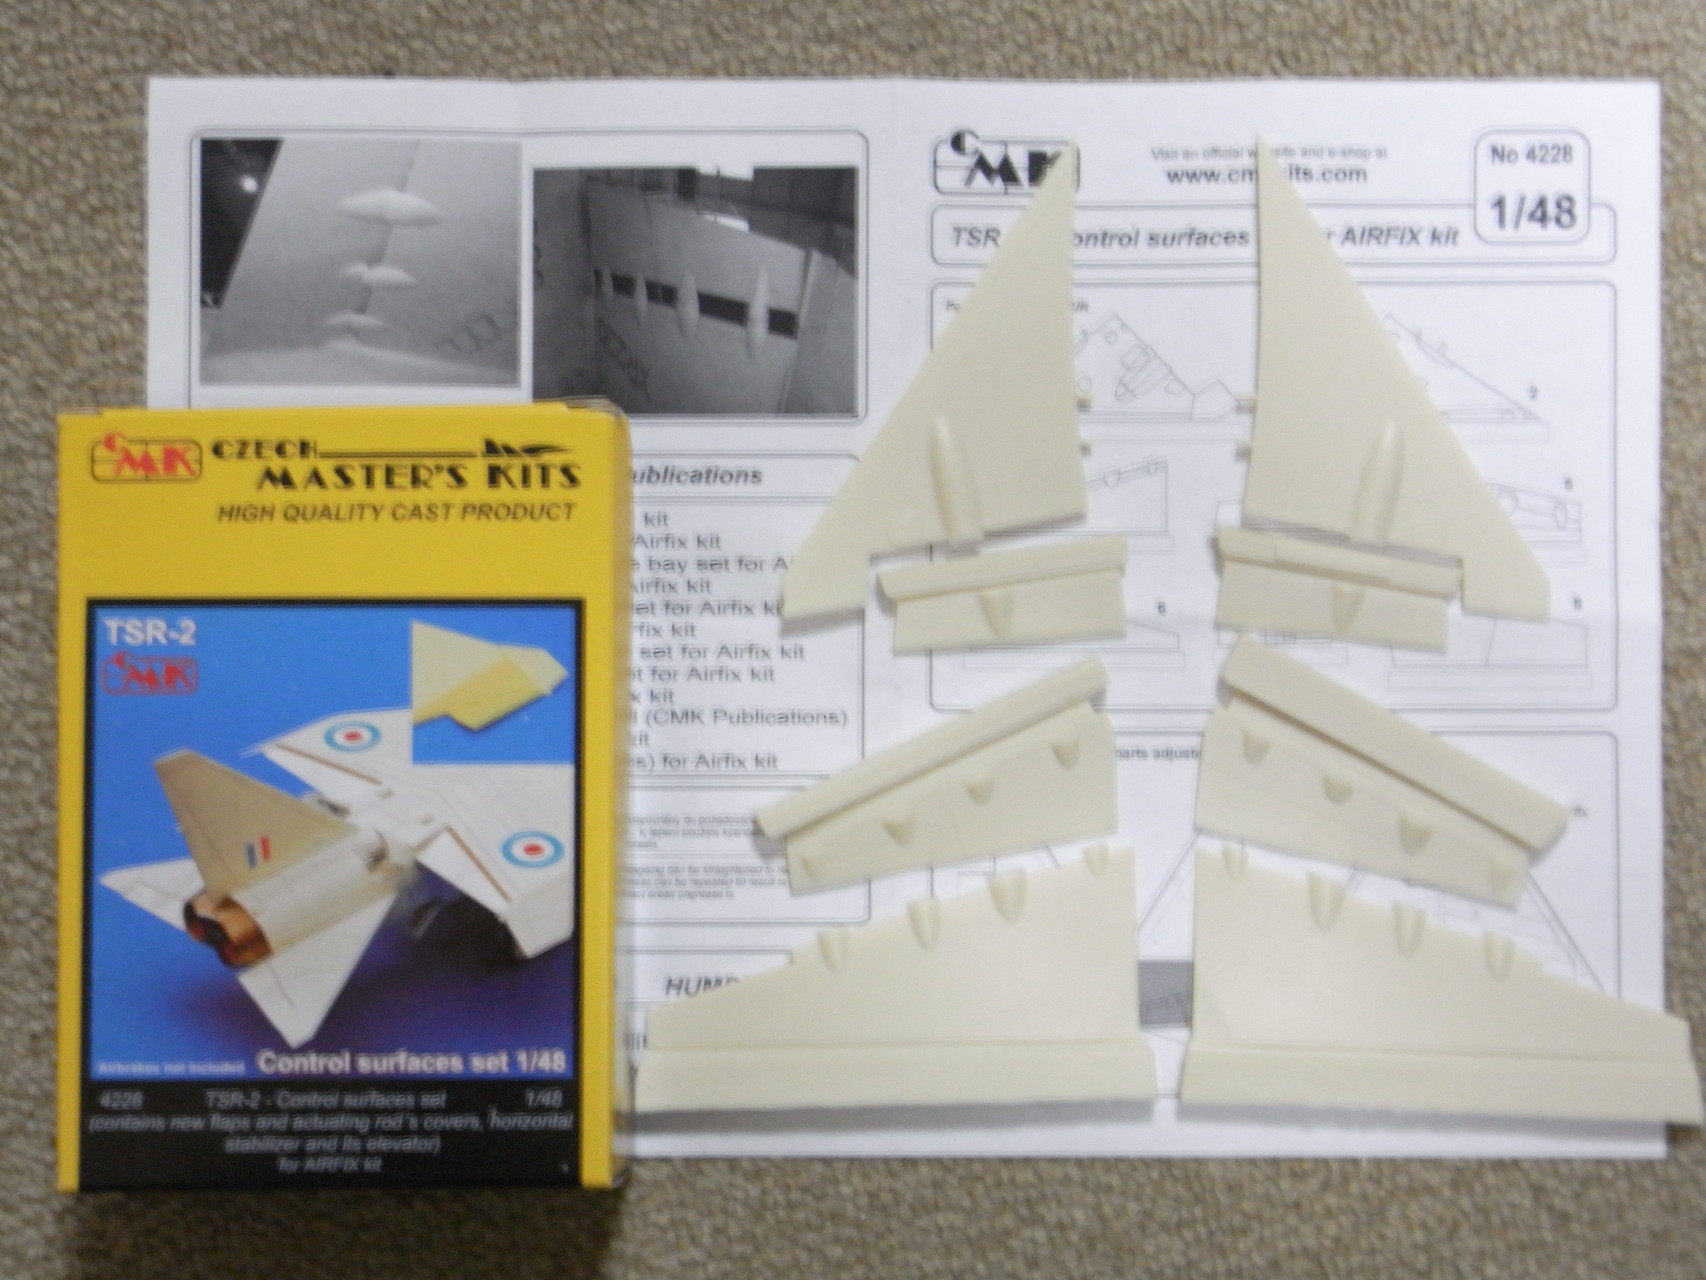 CMK 1//48 TSR-2 Control Surfaces Set for Airfix # 4228